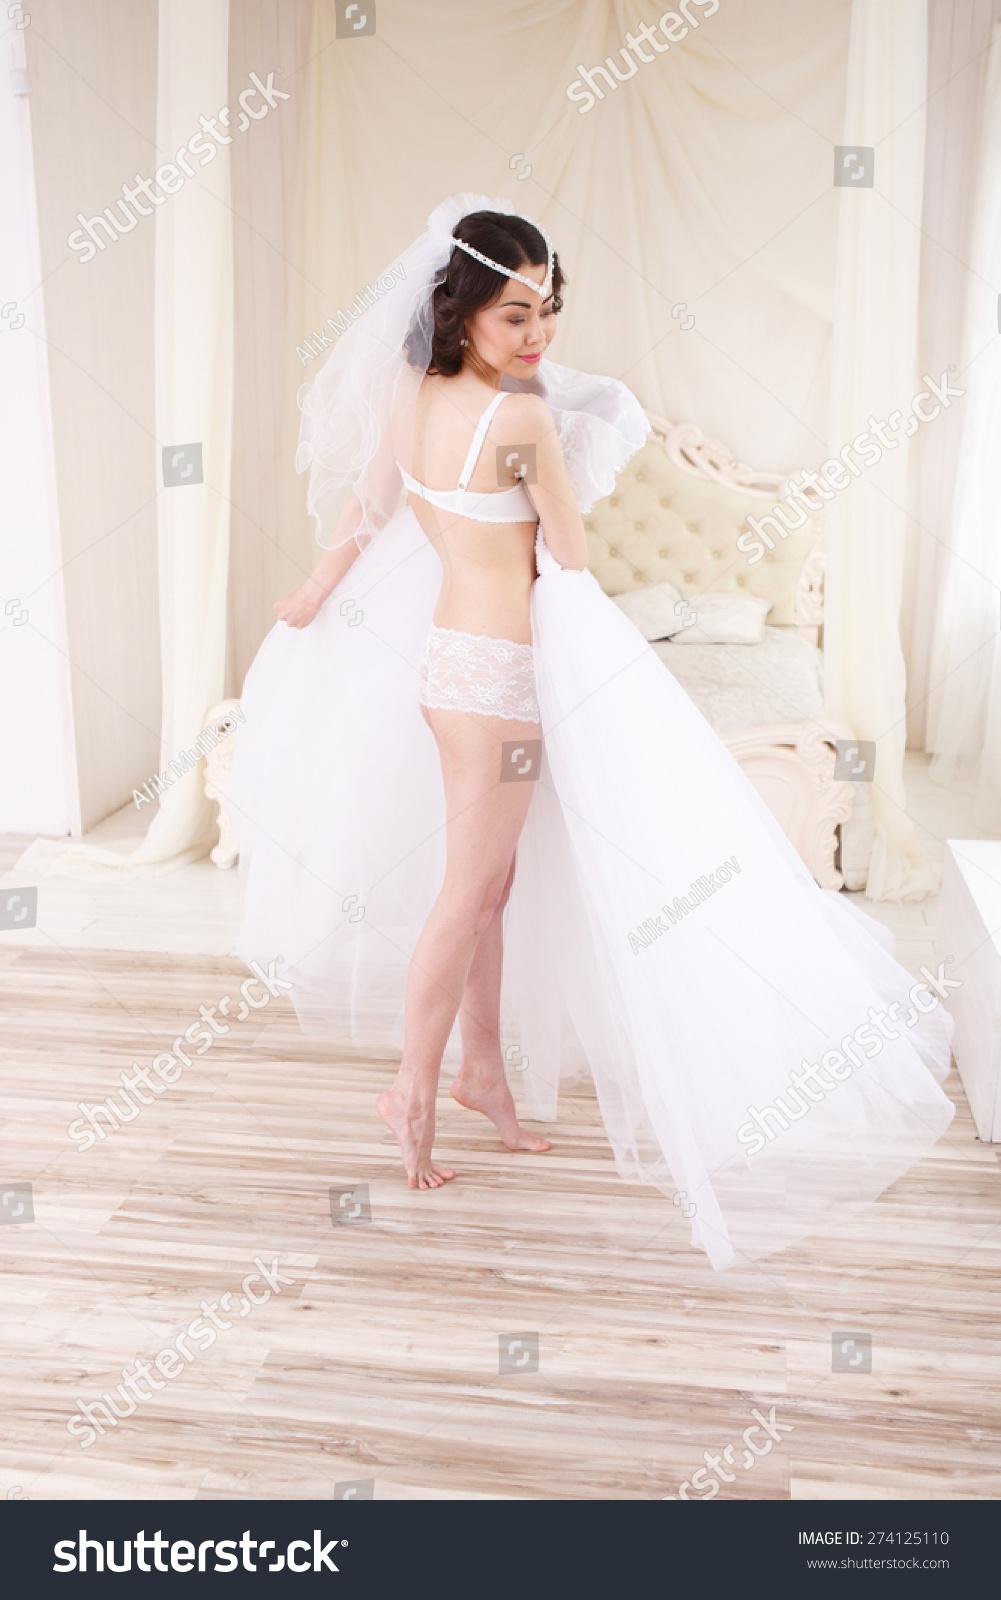 Beautiful Bride Lingerie Trying Wedding Dress Stock Photo (Royalty ...